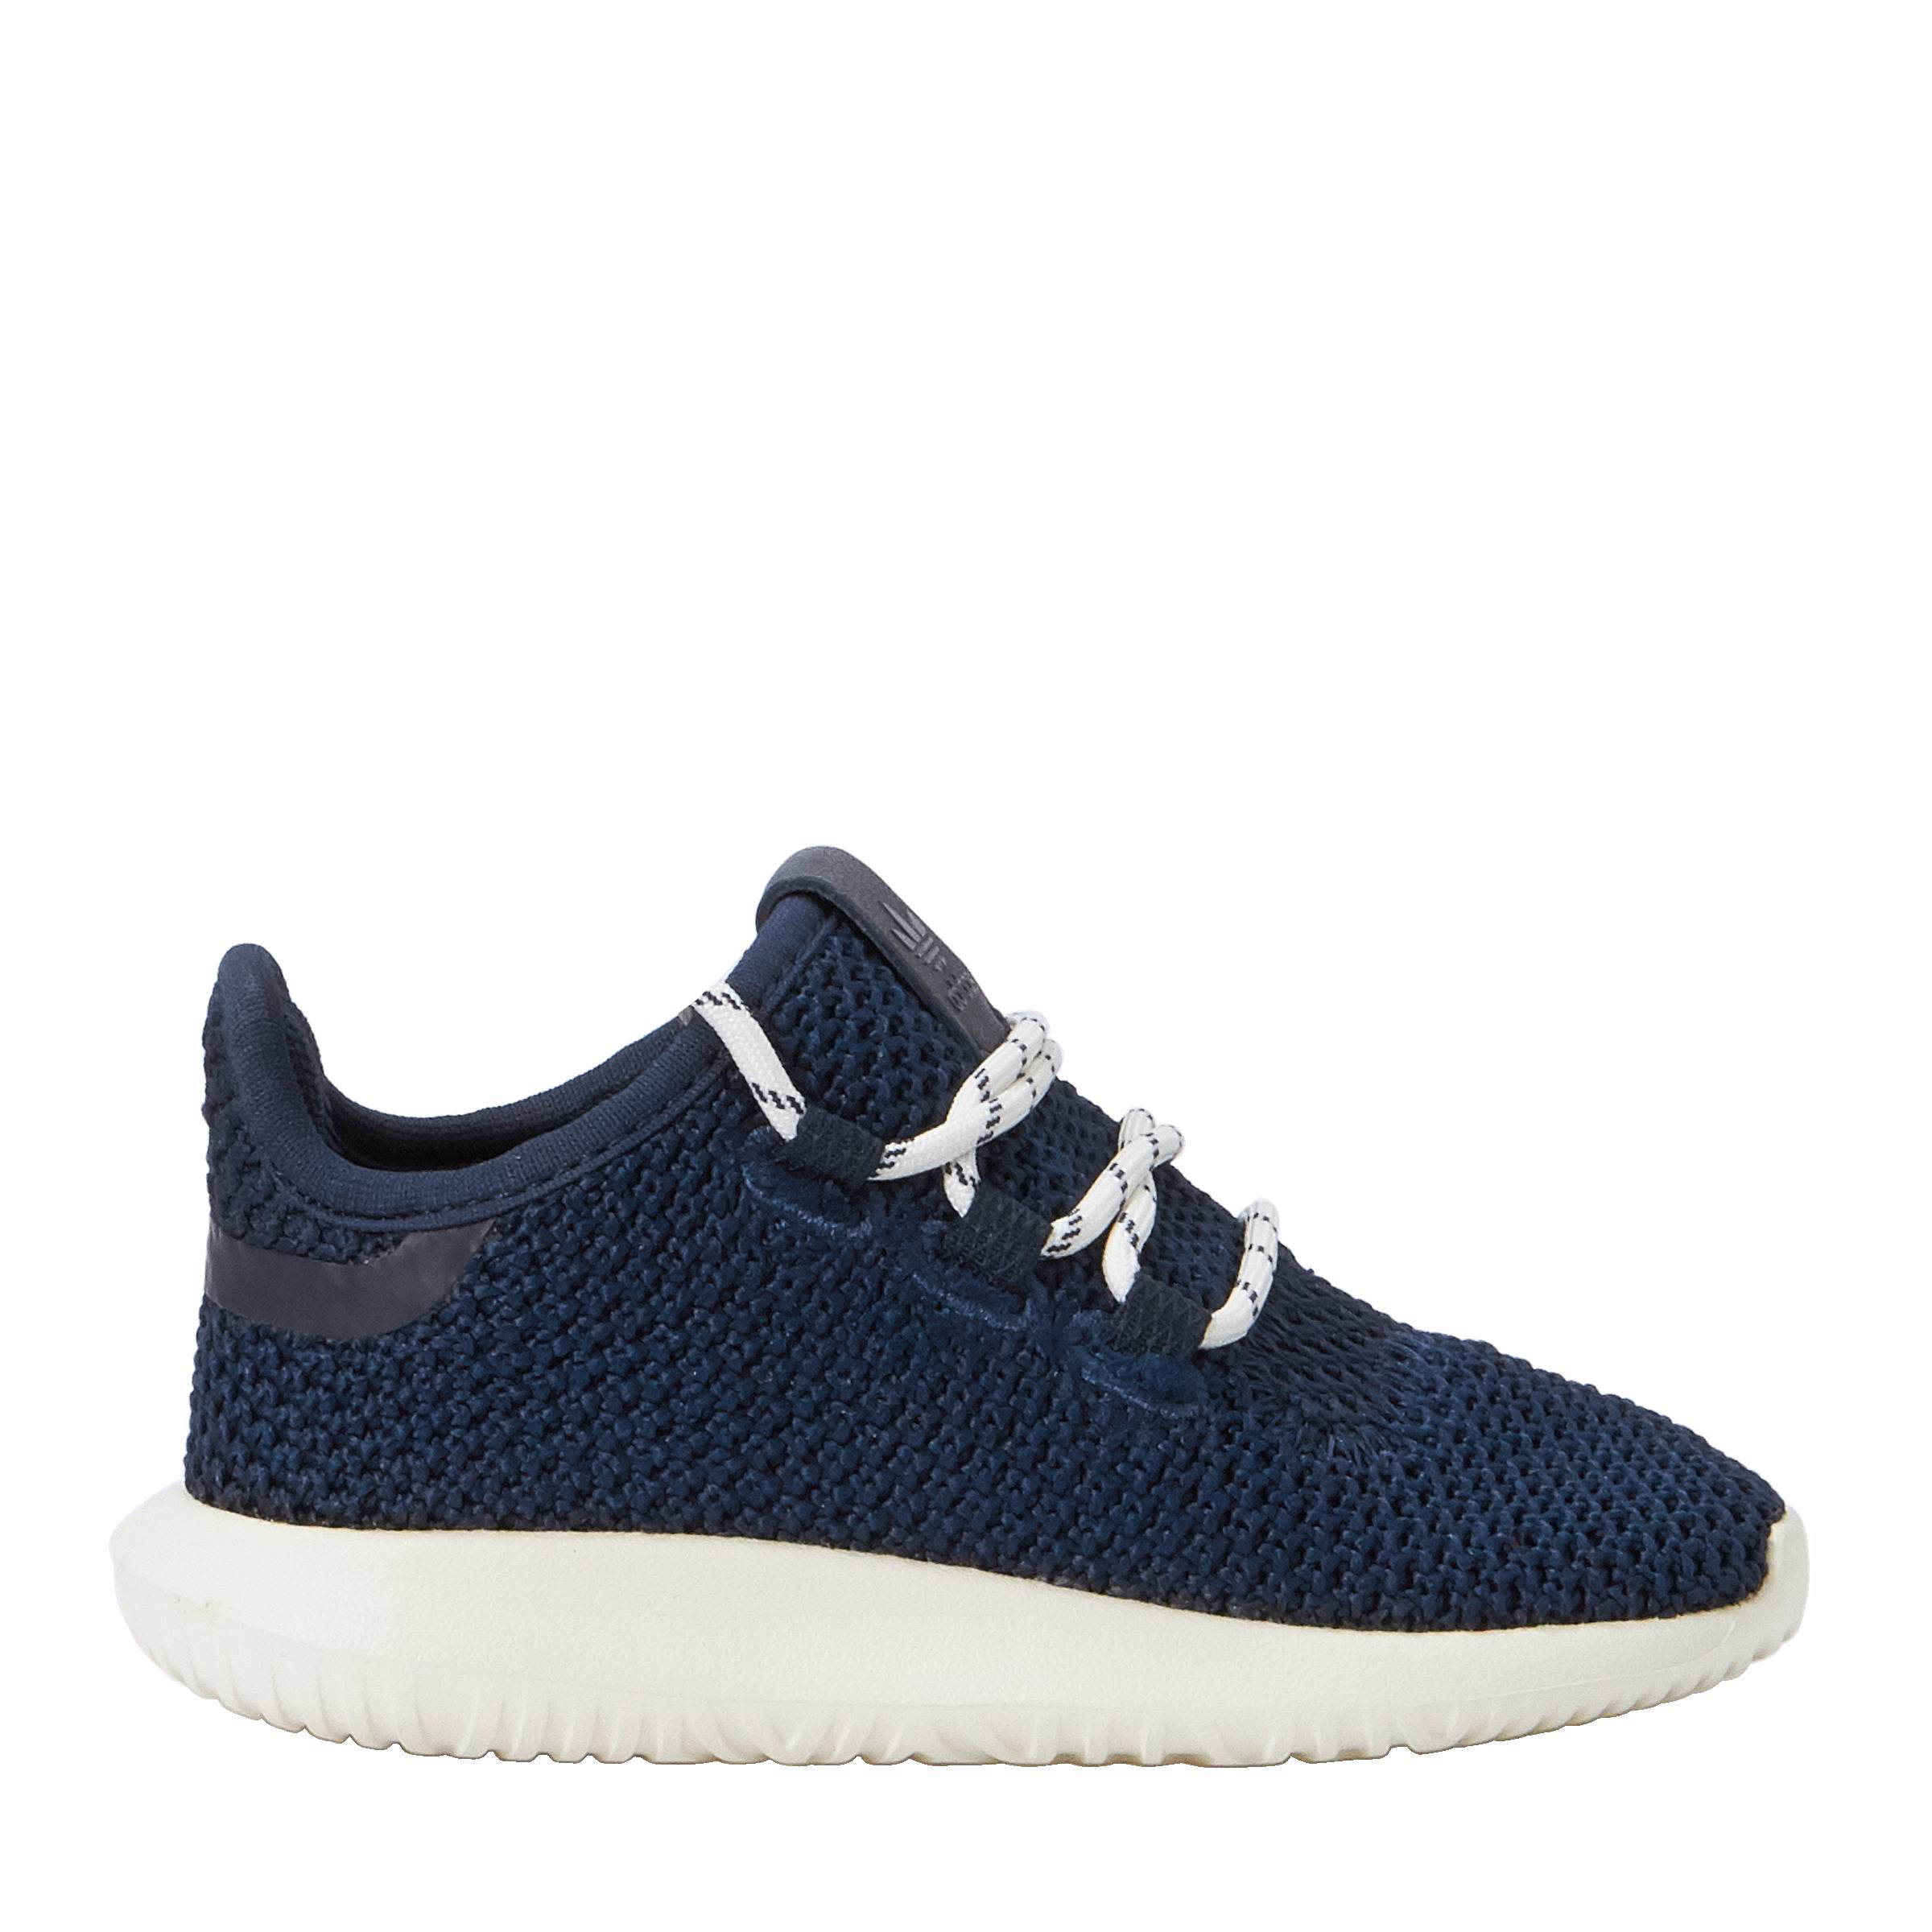 adidas Originals Tubular Shadow I sneakers